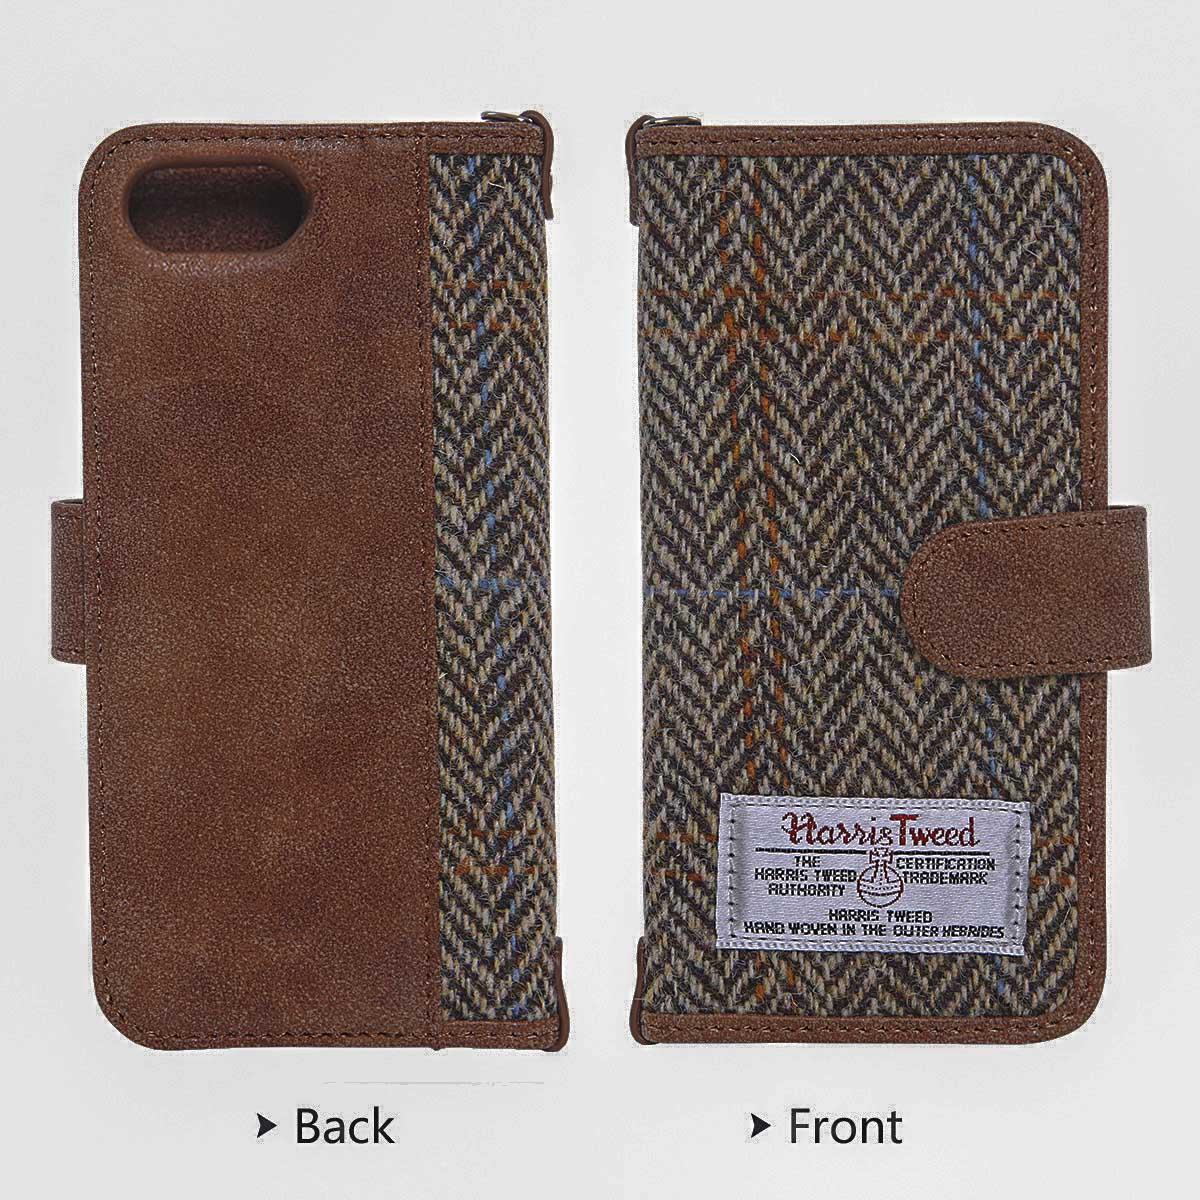 Harris Tweed iPhone 7 Case, Hard PC+ Premium Cotton Material Wallet Phone Case